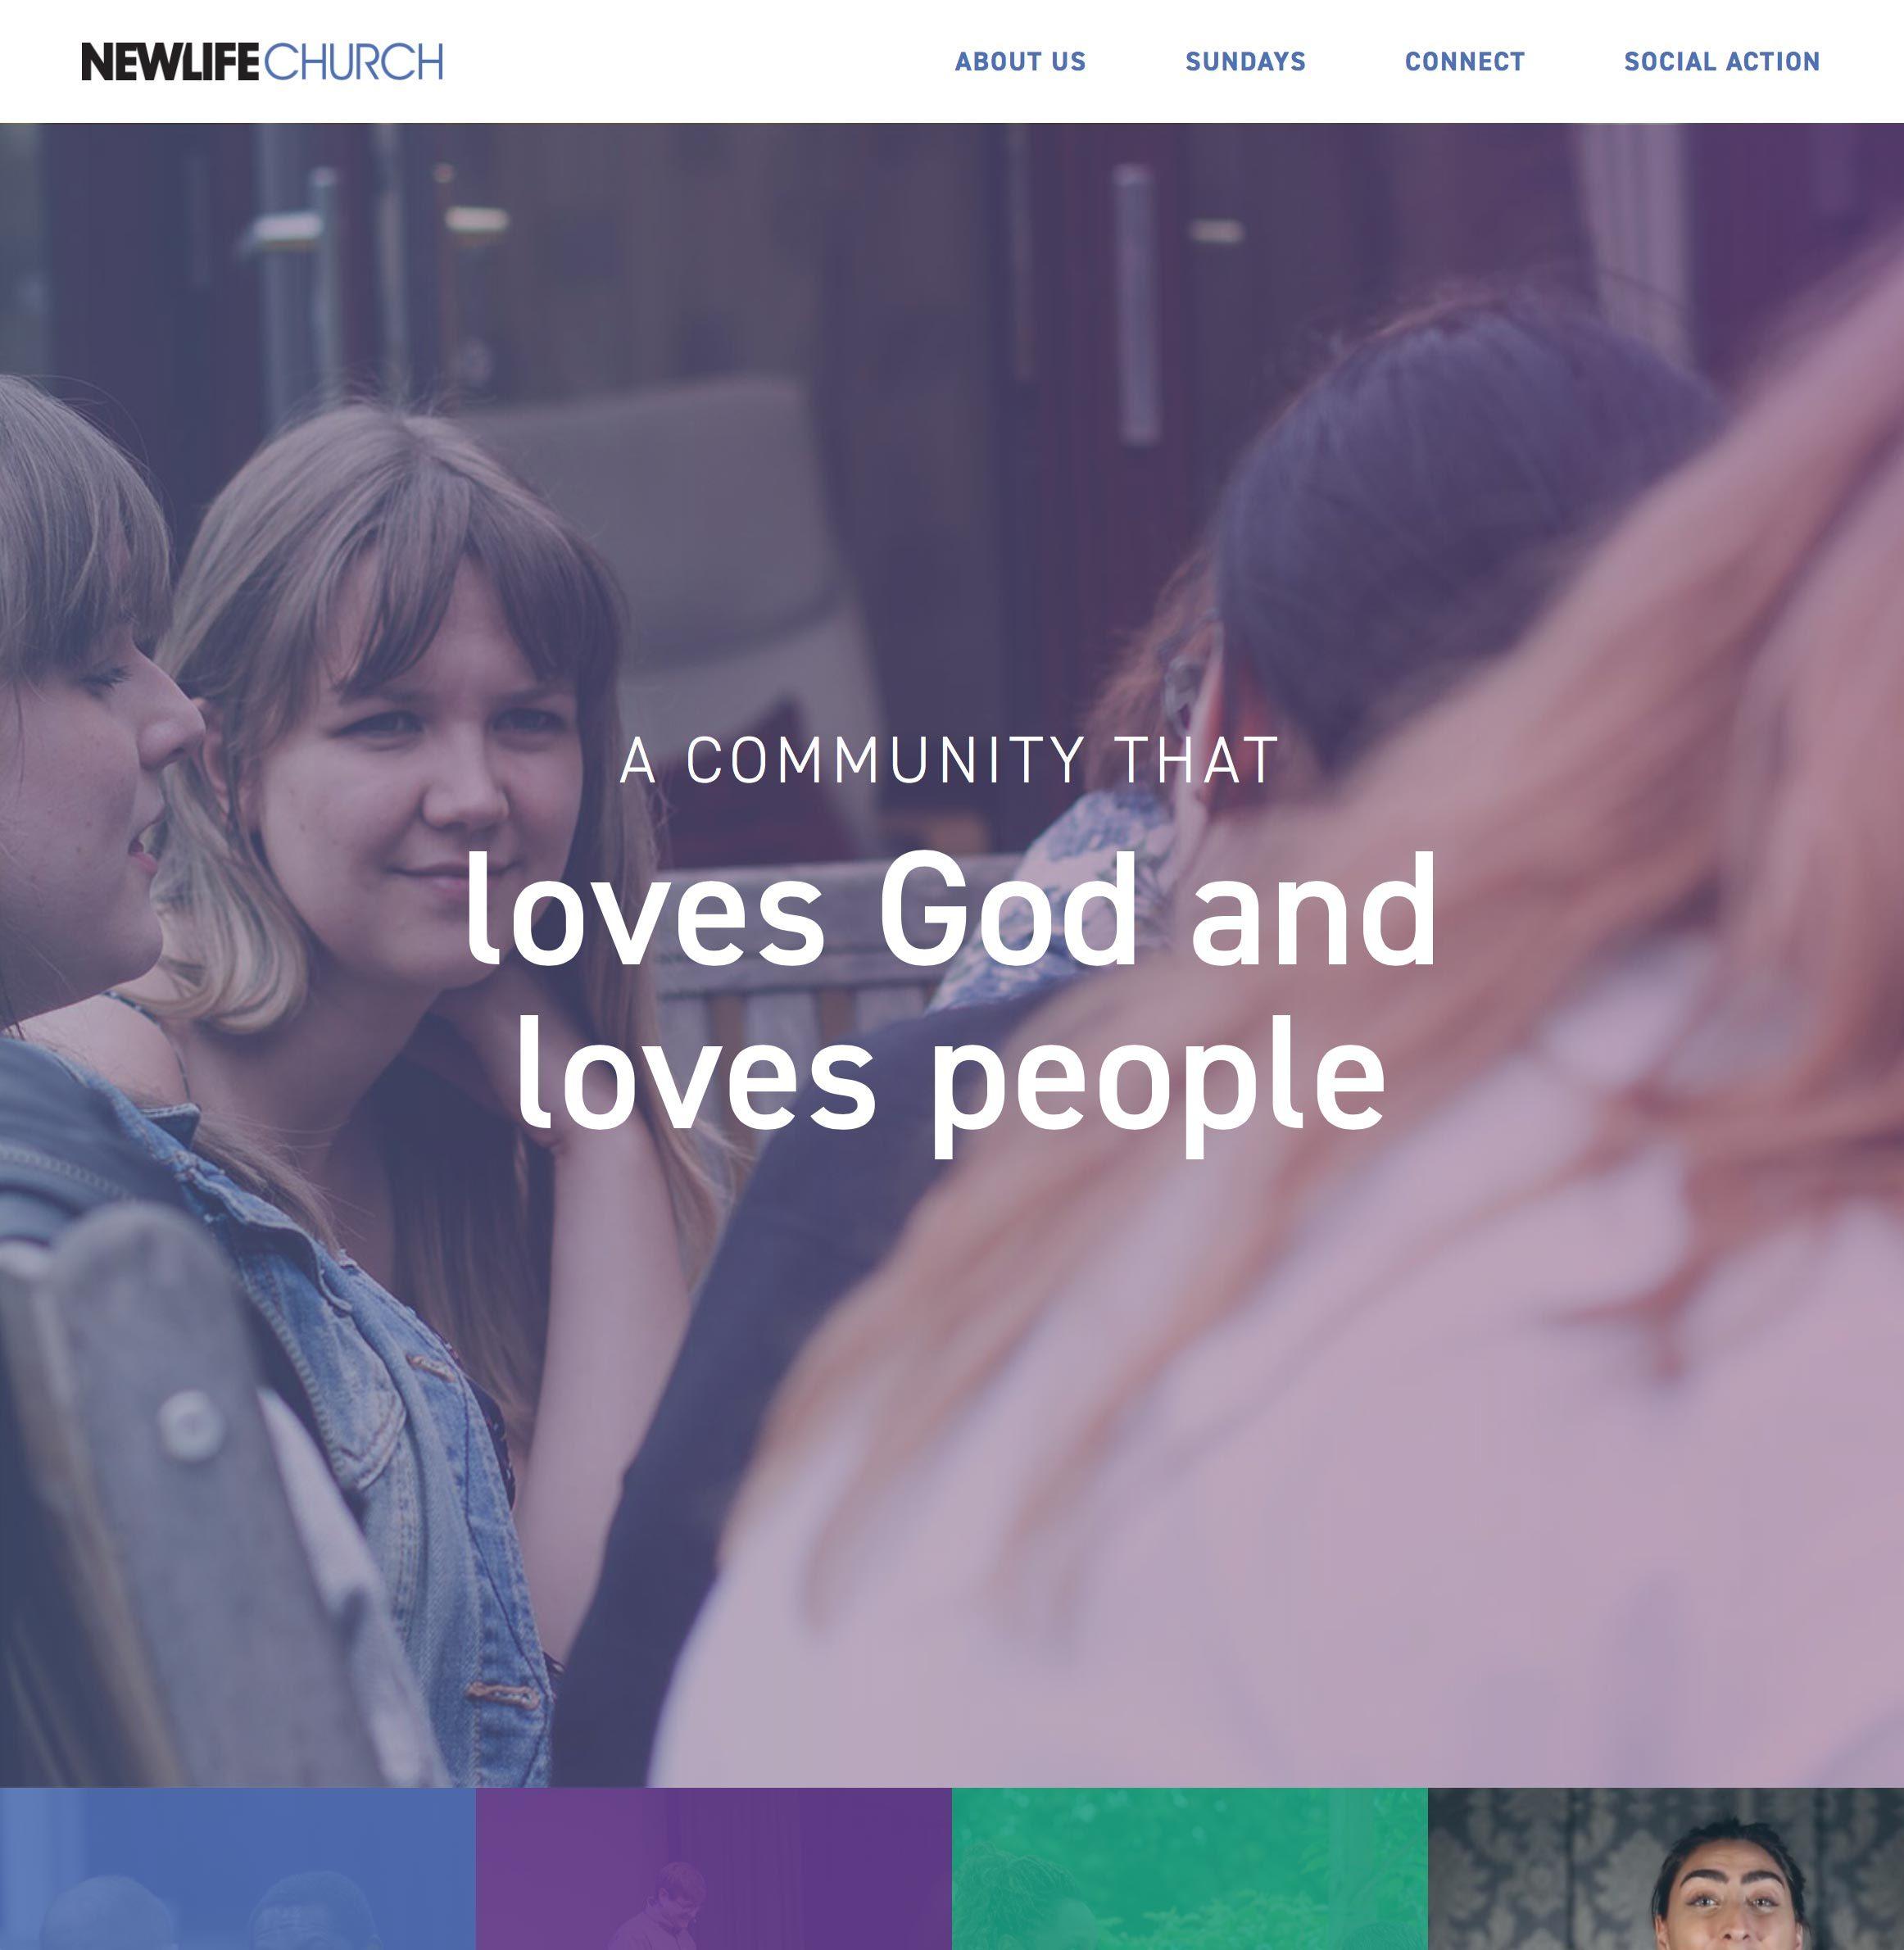 new-life-church-milton-keynes-home-page.jpg